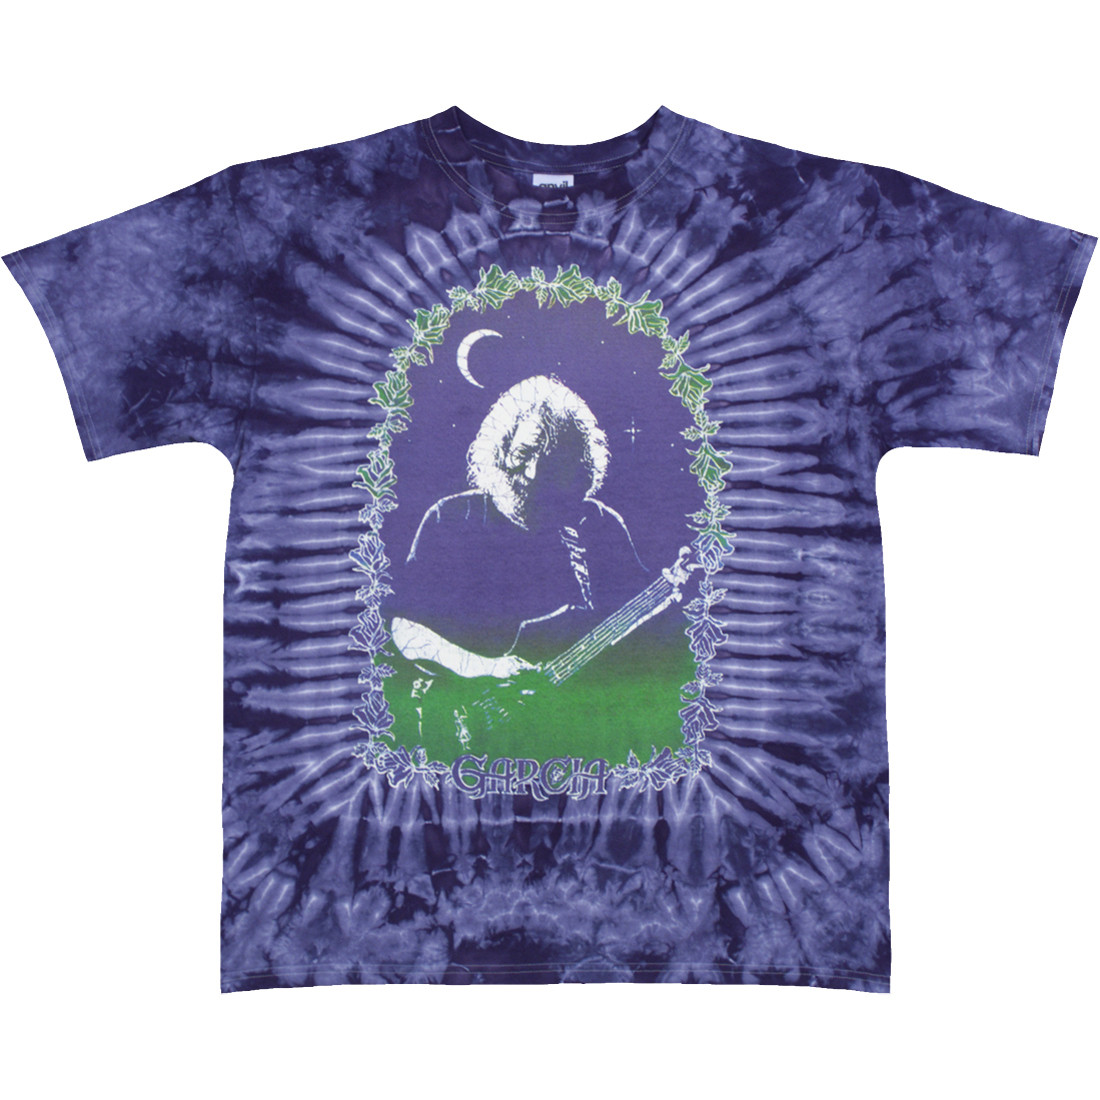 Jerry Garcia Roses Tie-Dye T-Shirt